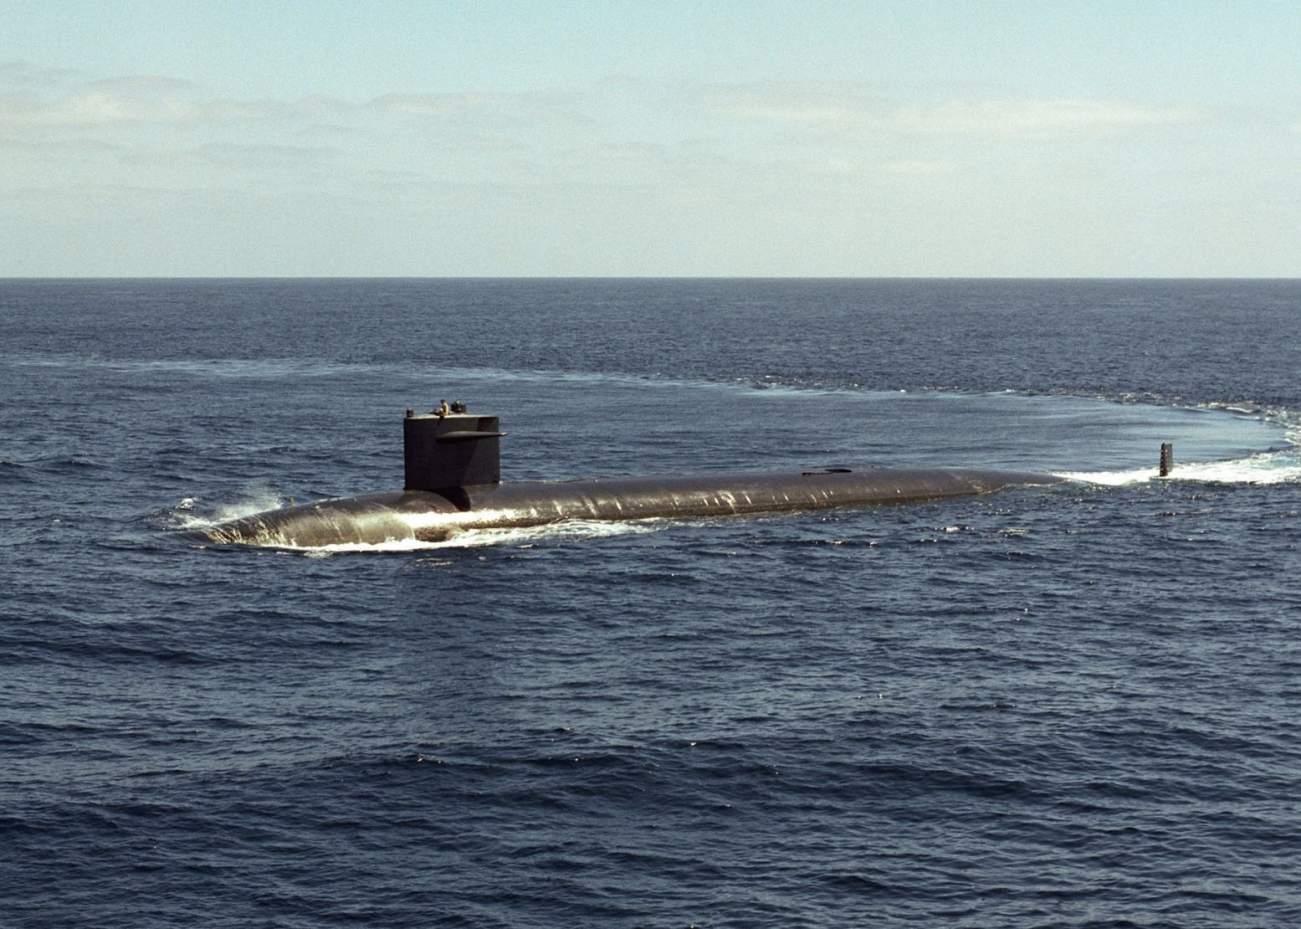 History's Mystery: What Sank the Navy Submarine USS Thresher?